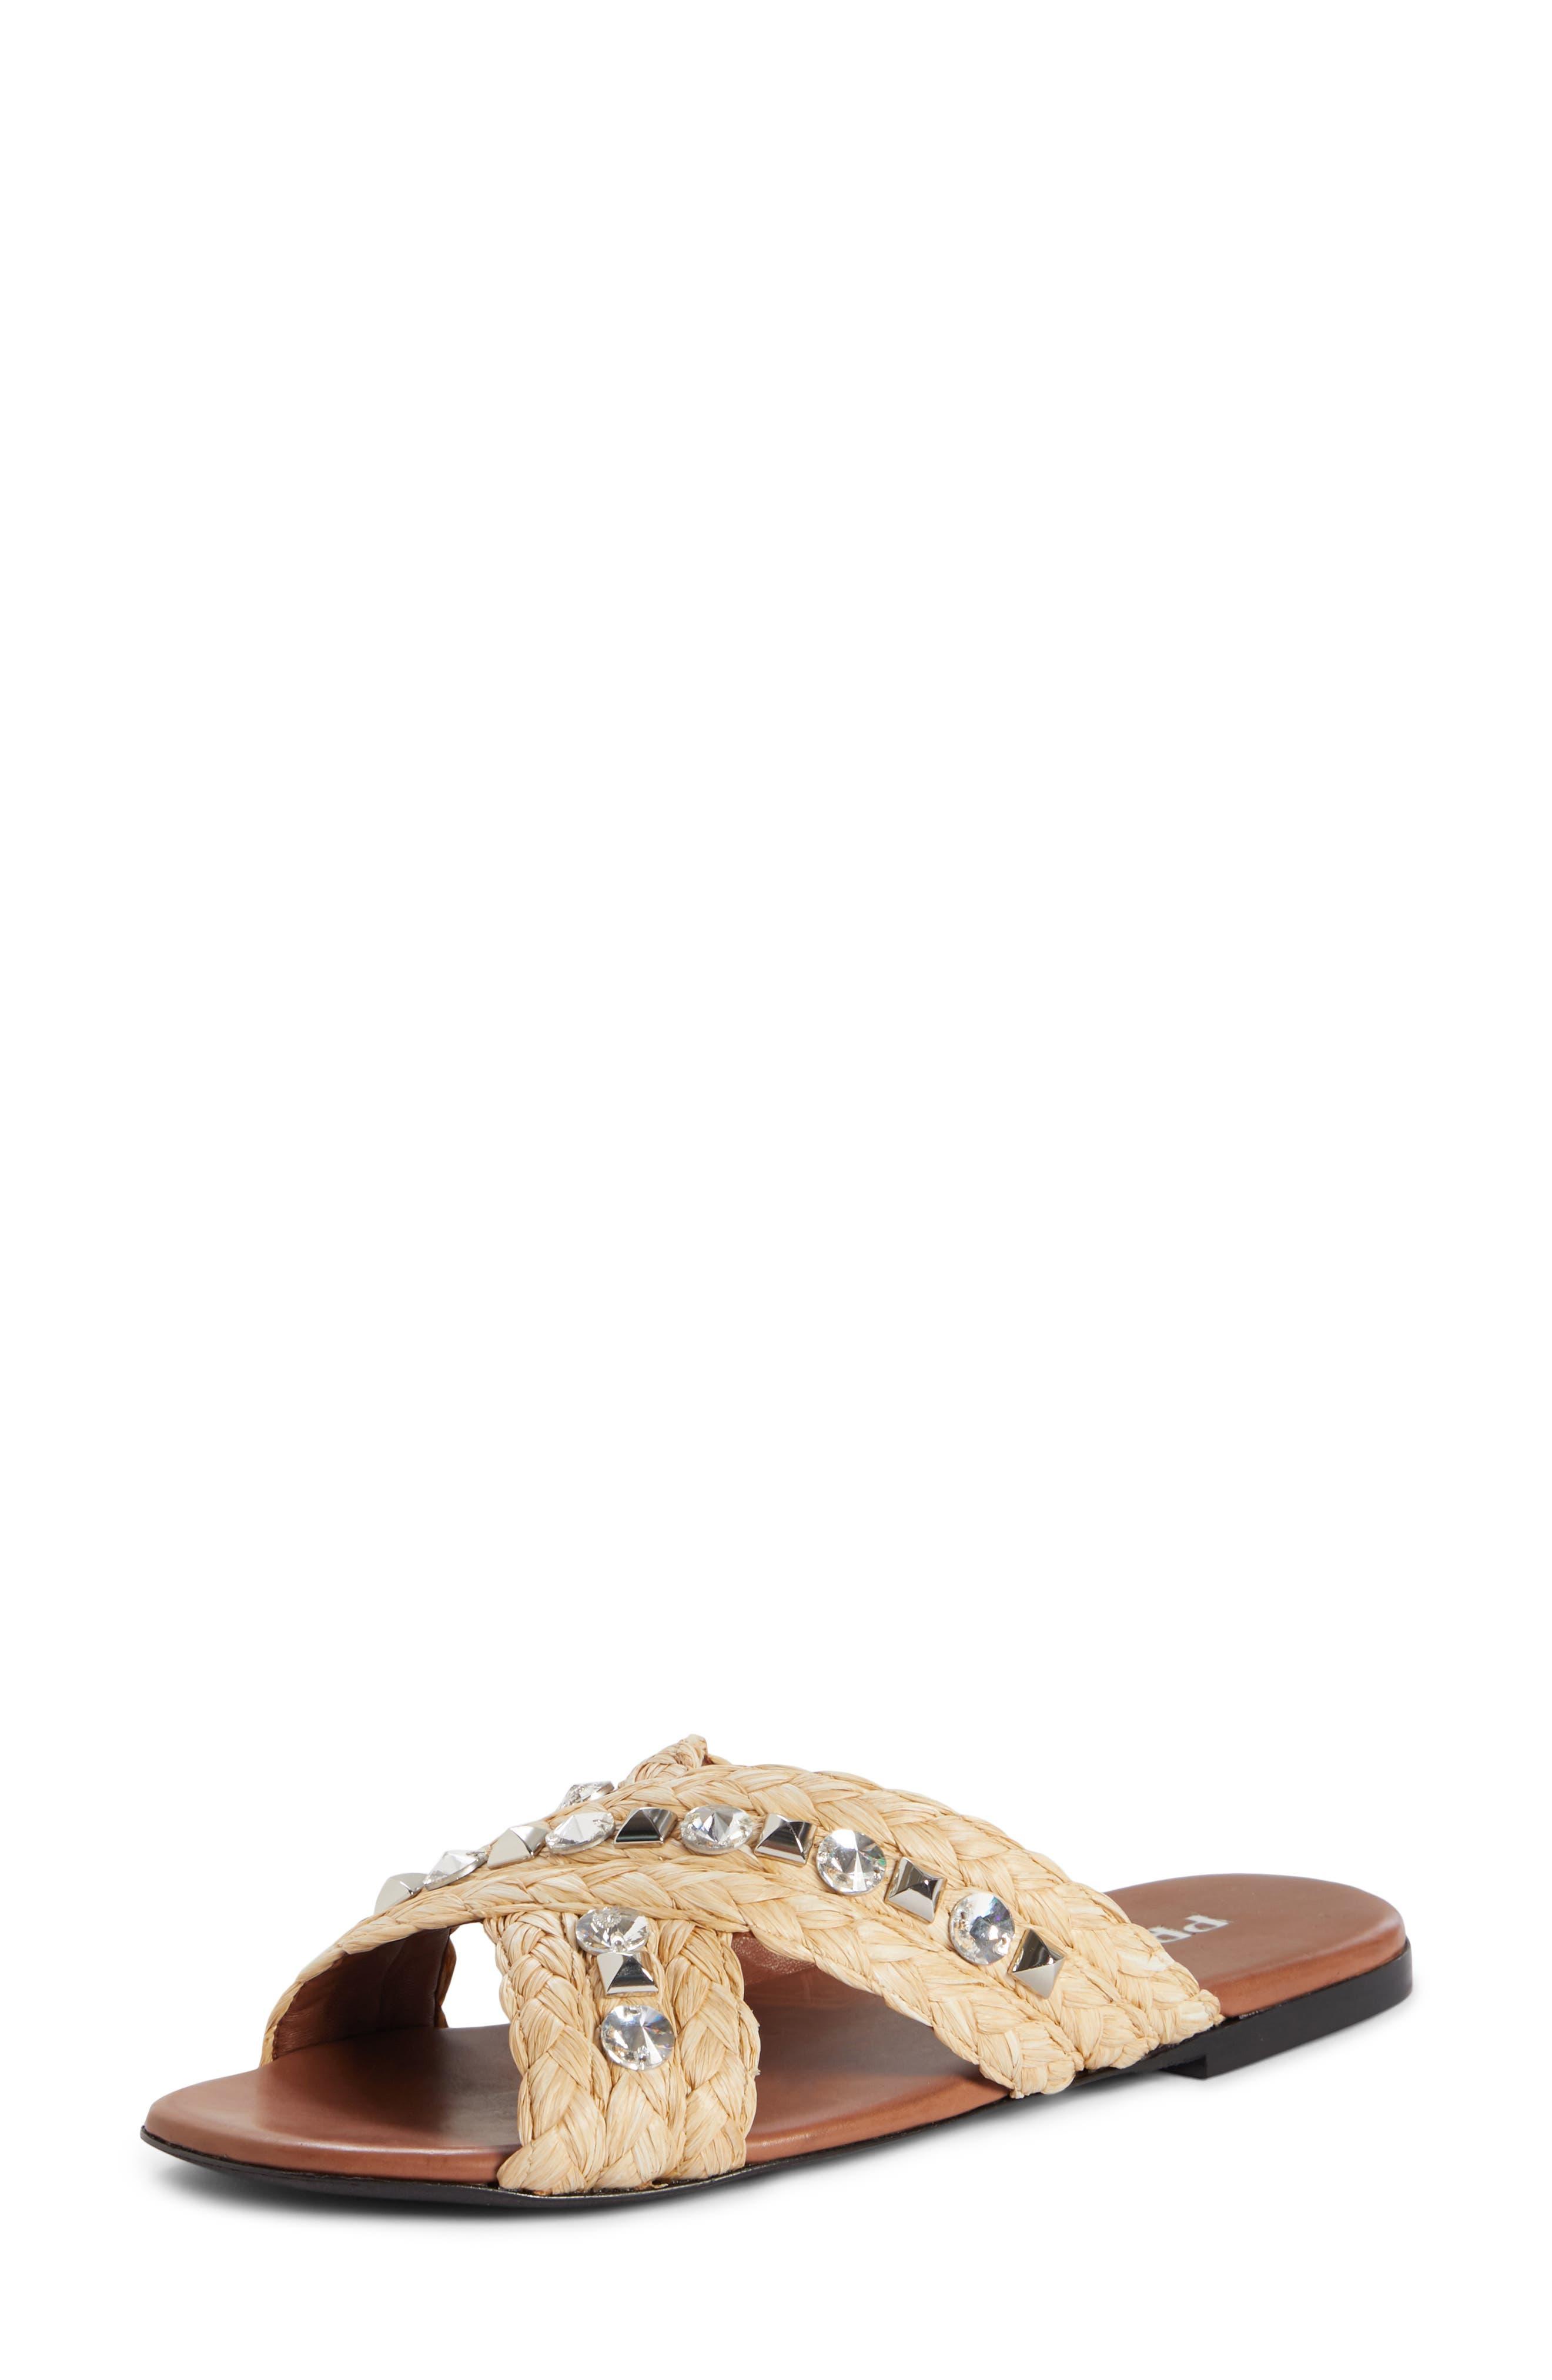 PRADA,                             Embellished Slide Sandal,                             Main thumbnail 1, color,                             NATURAL RAFFIA